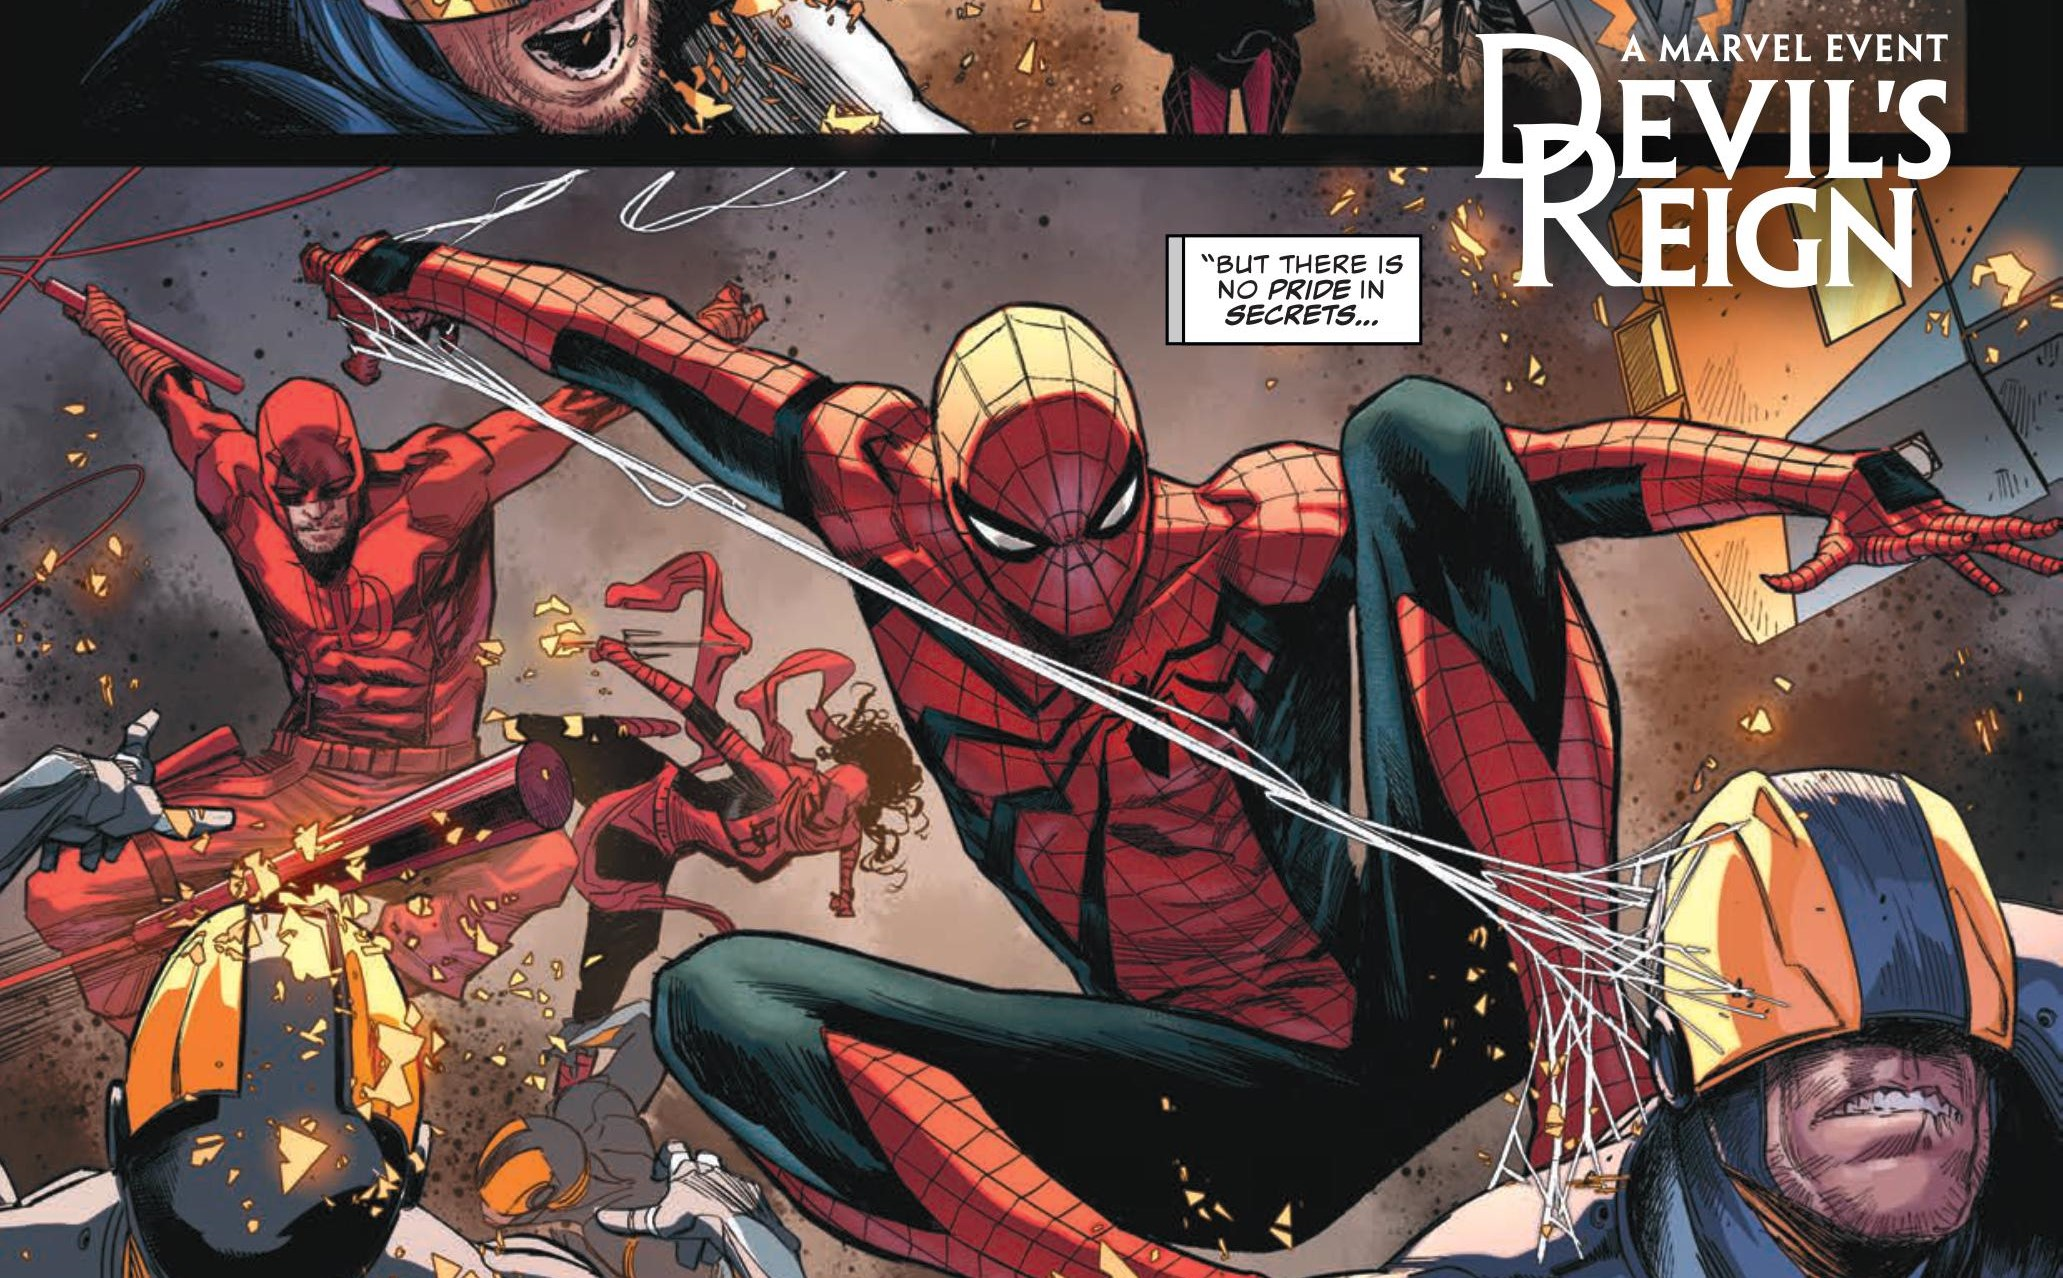 Daredevil and Spider-Man in Devil's Reign